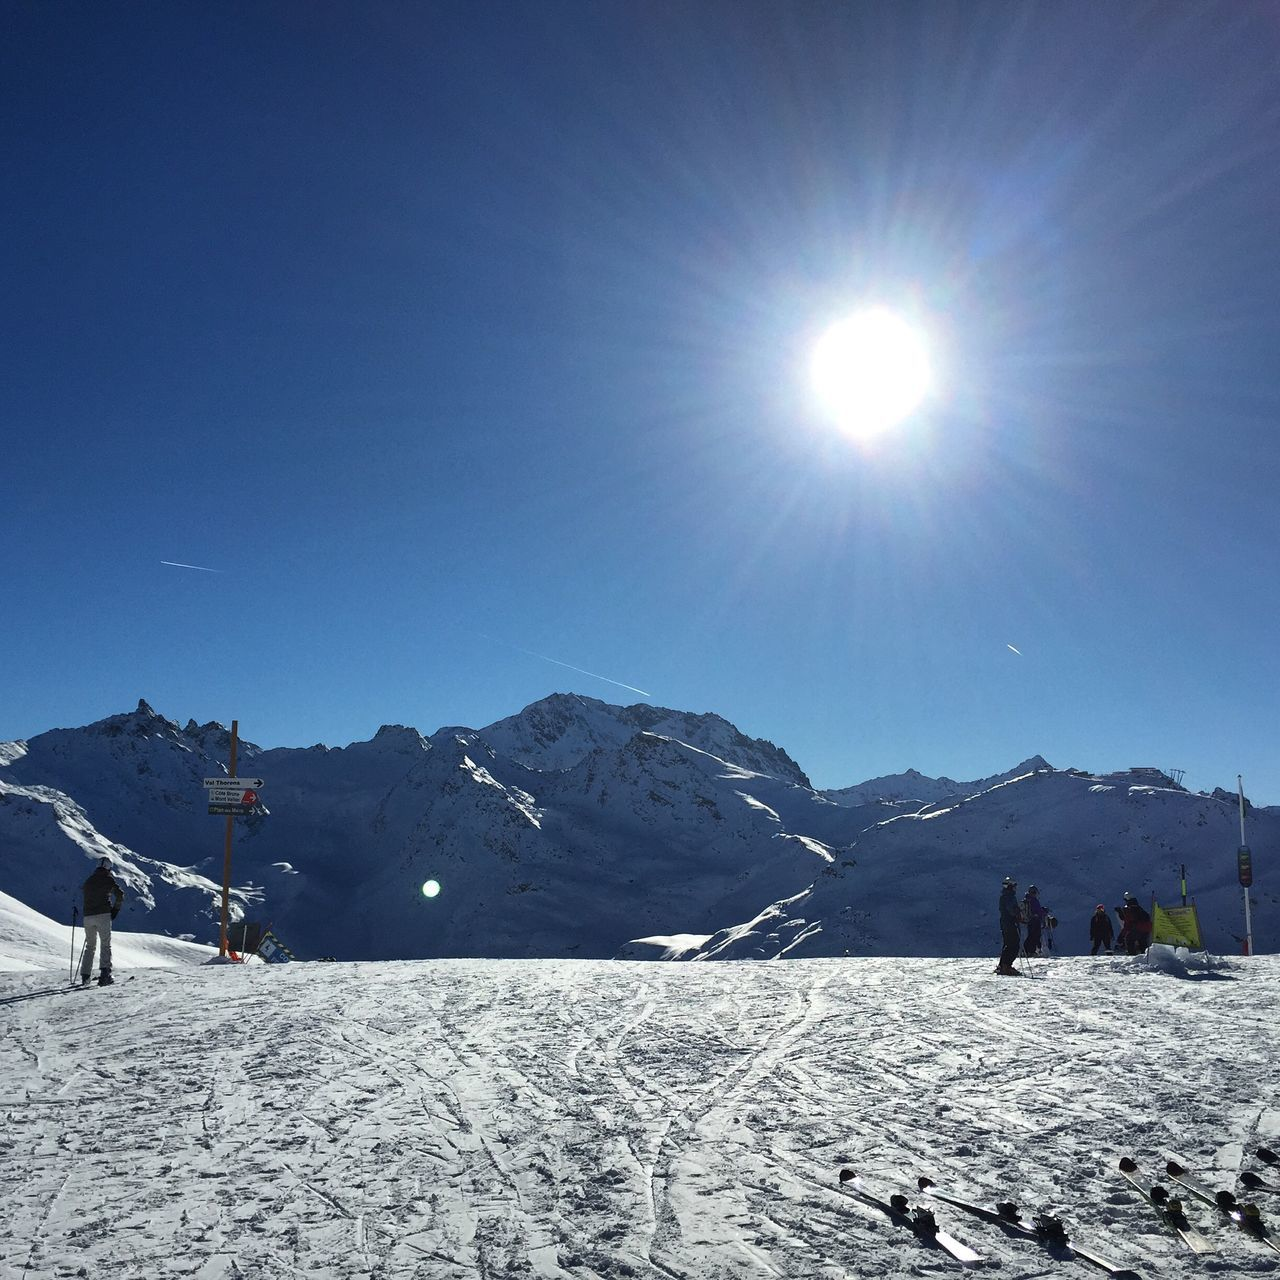 Meribel Alpes AlpesFrancaises Montagne Mountains Skiing Ski Neige Snow Sun Soleil Ciel Bleu Blue